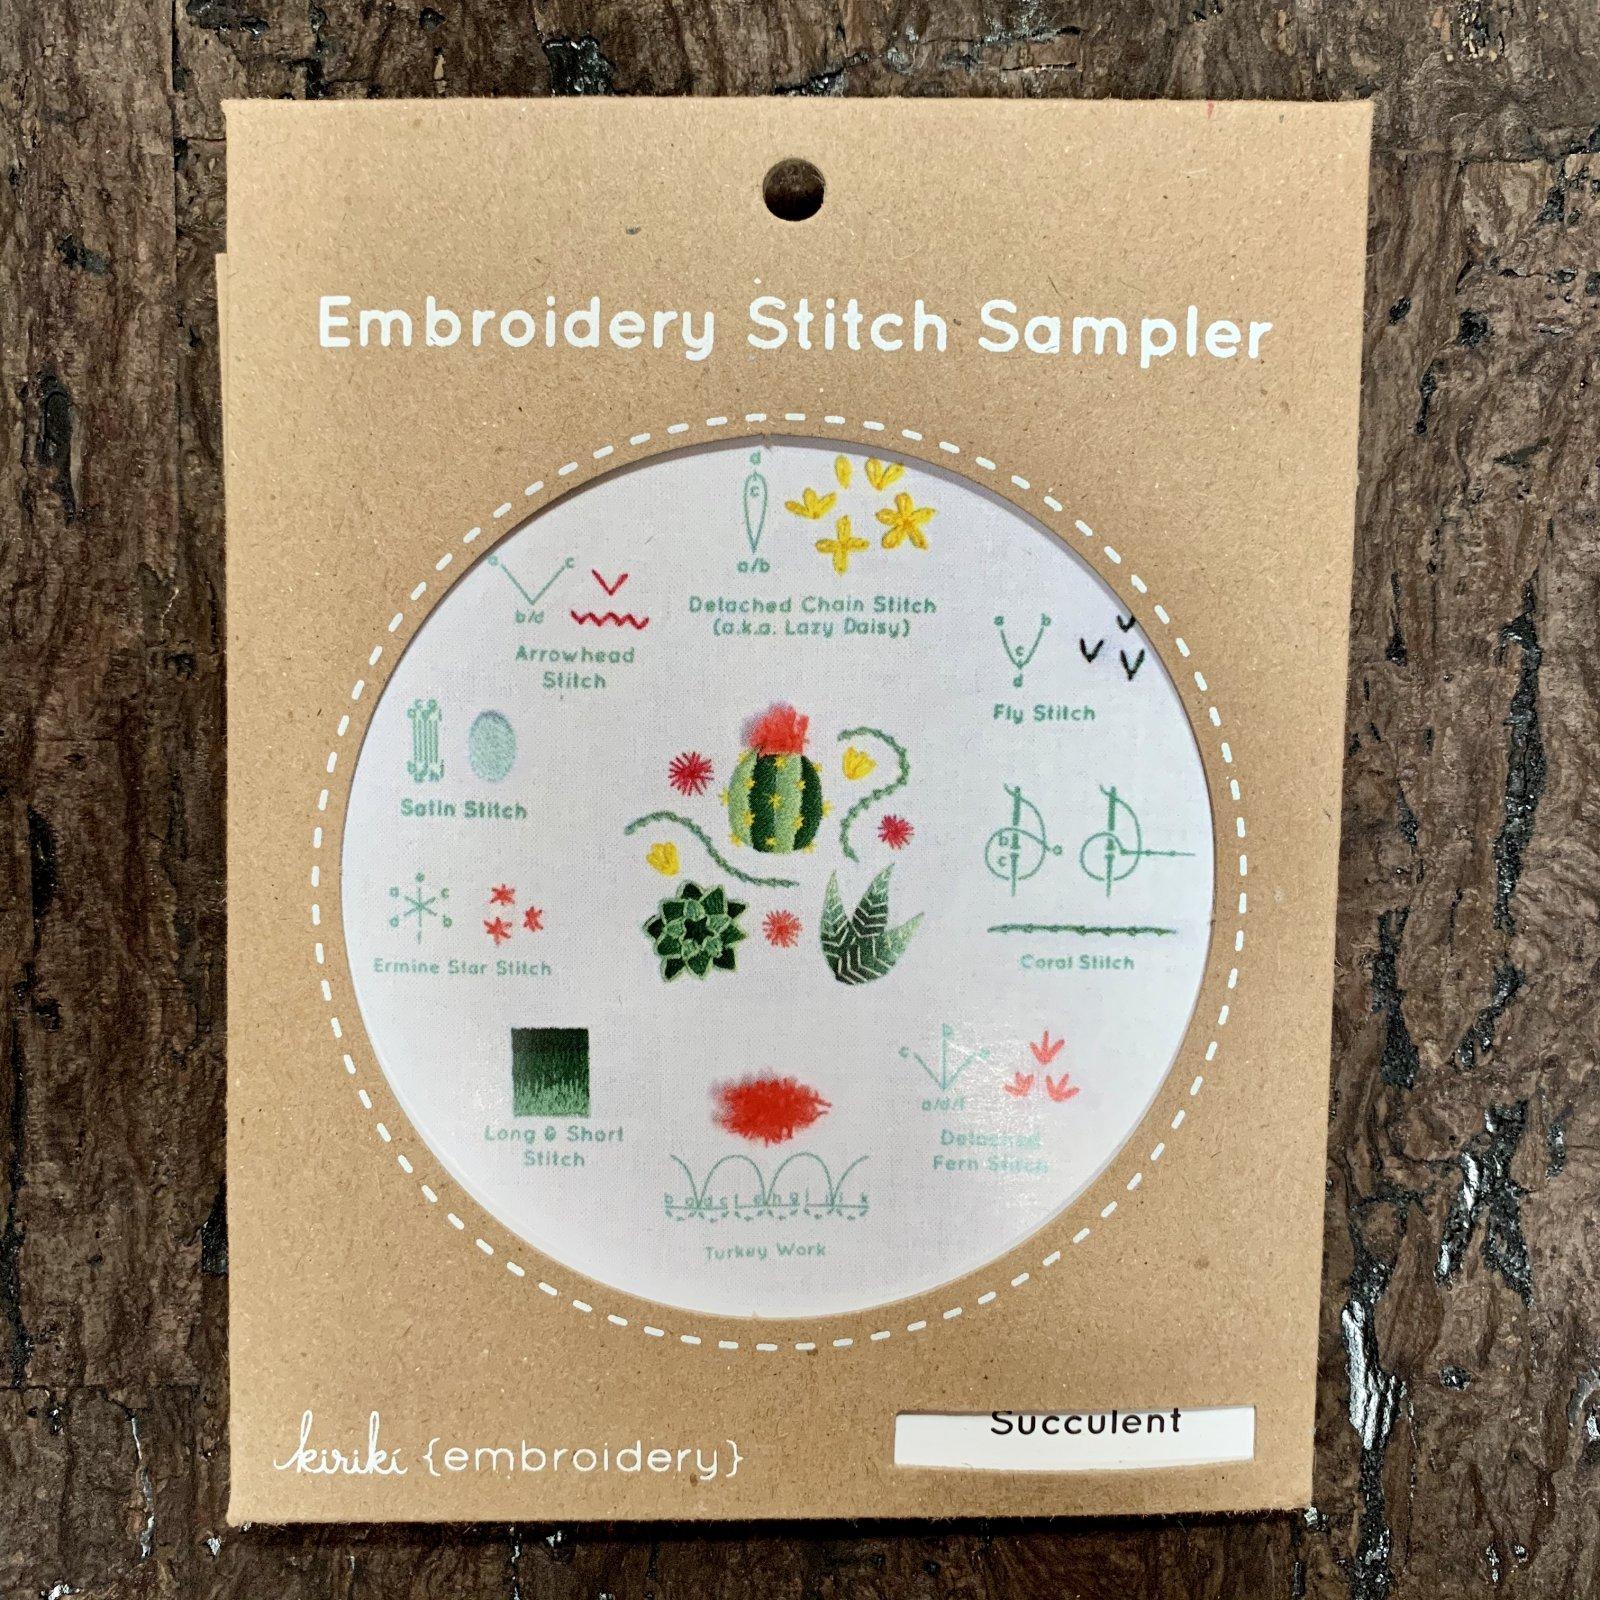 Succulent - Kiriki Embroidery Stitch Sampler Kit